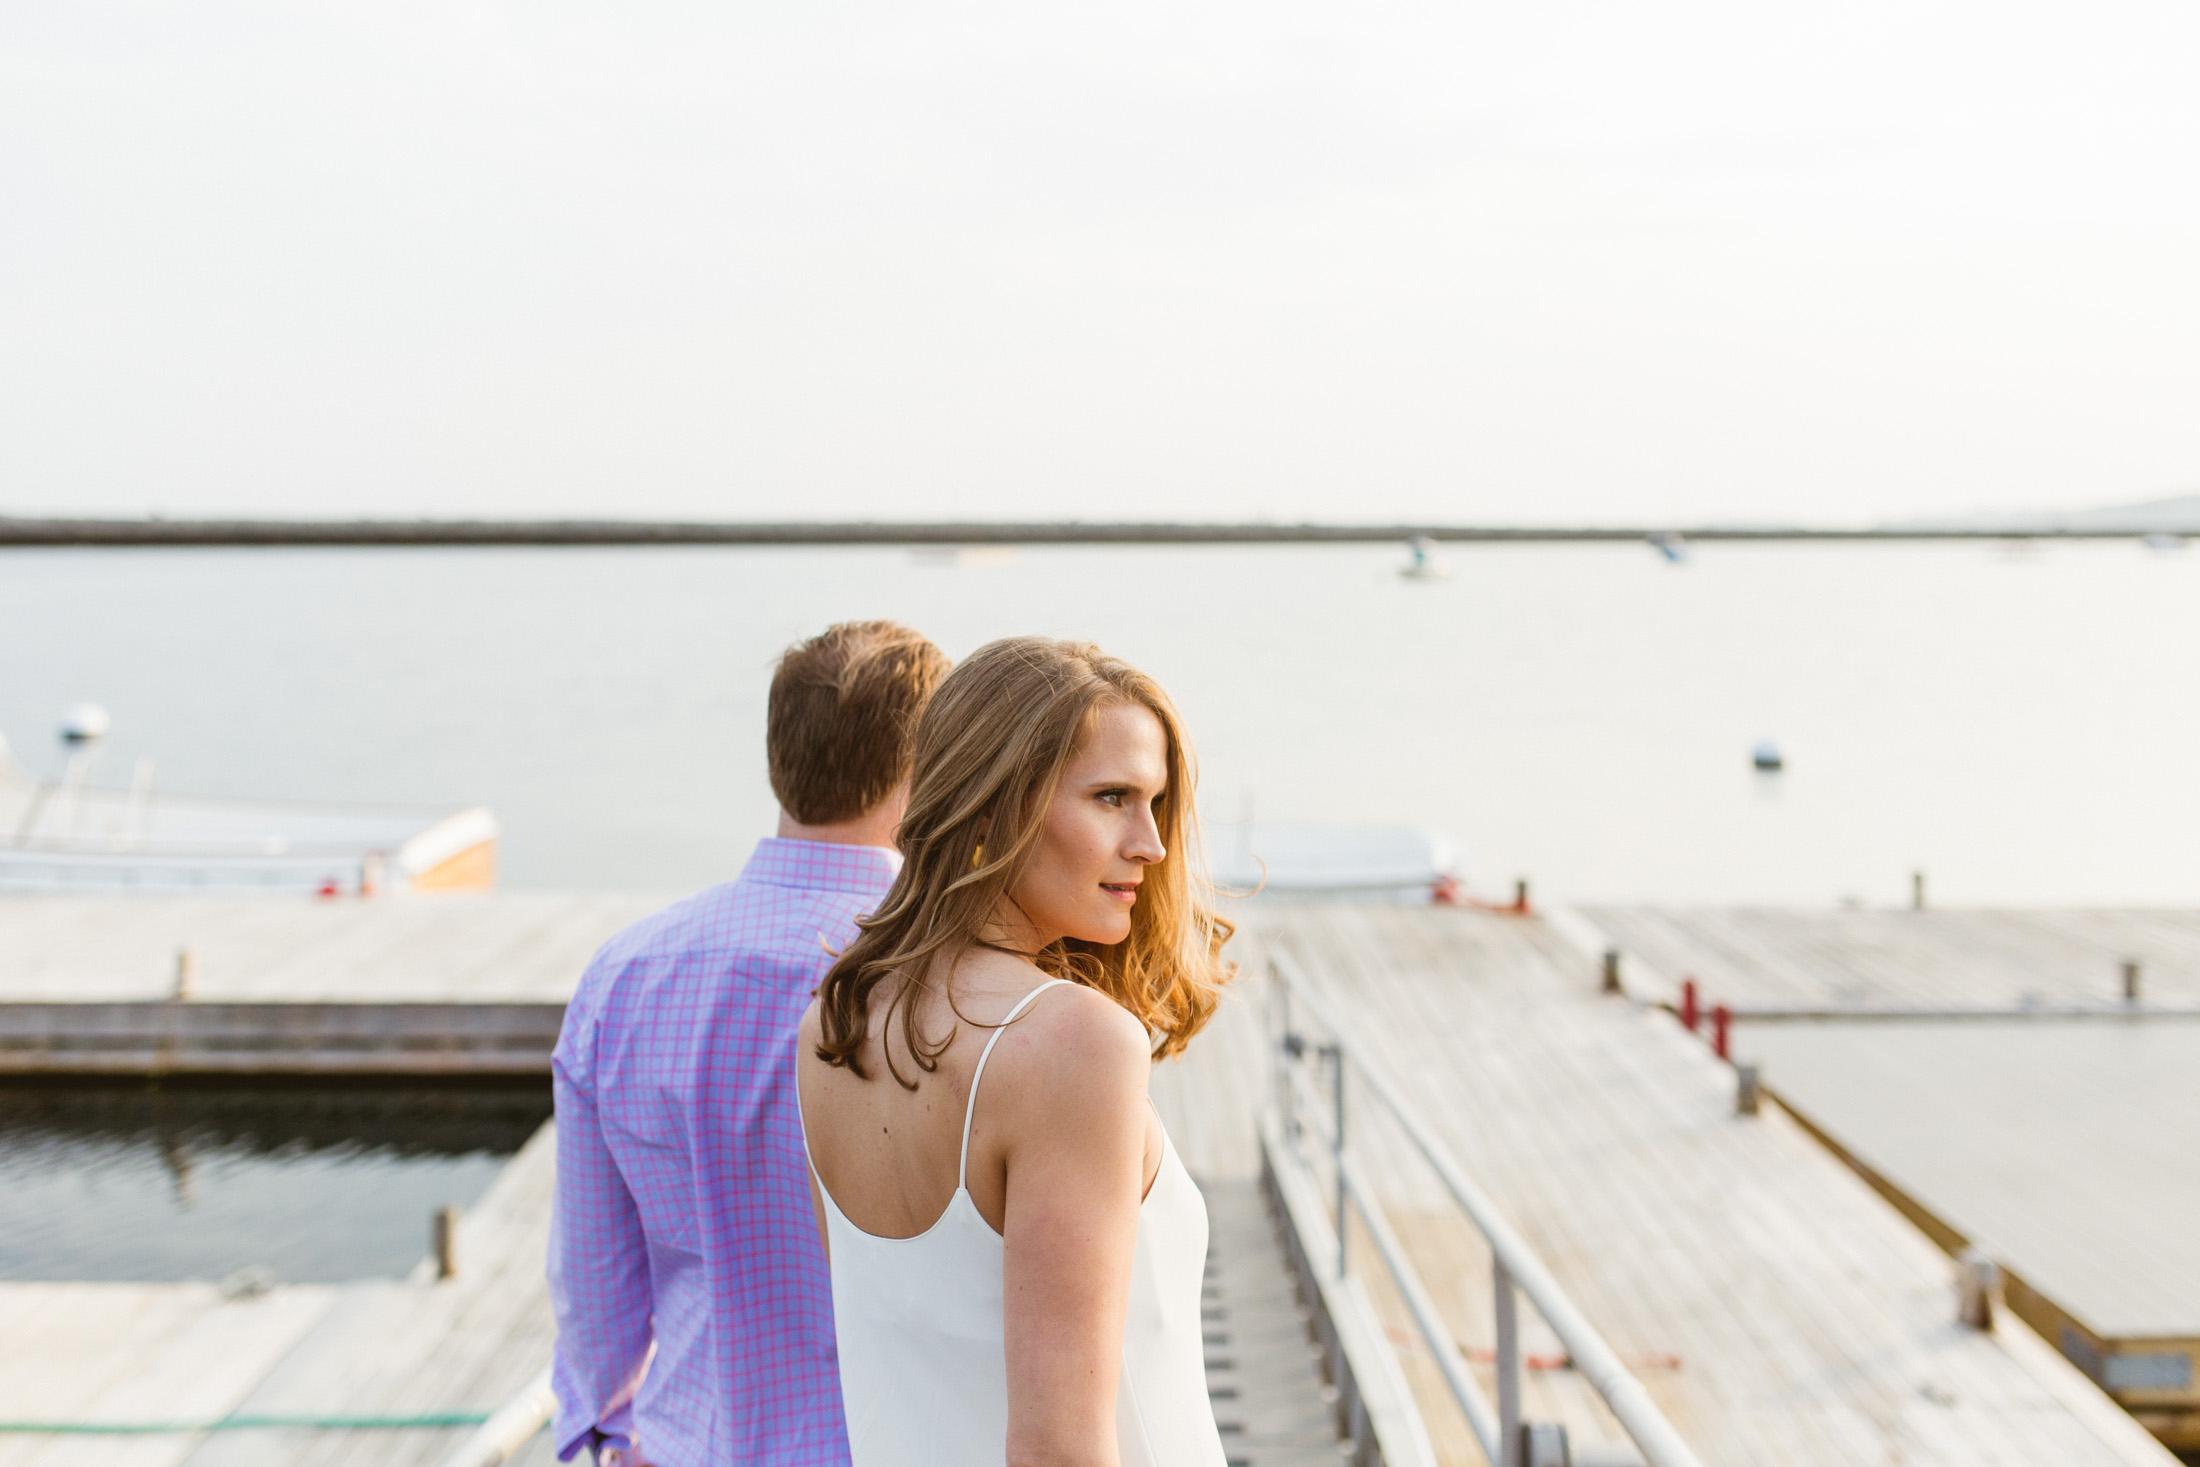 Eastern-Point-yacht-Club-Engagement-7.jpg